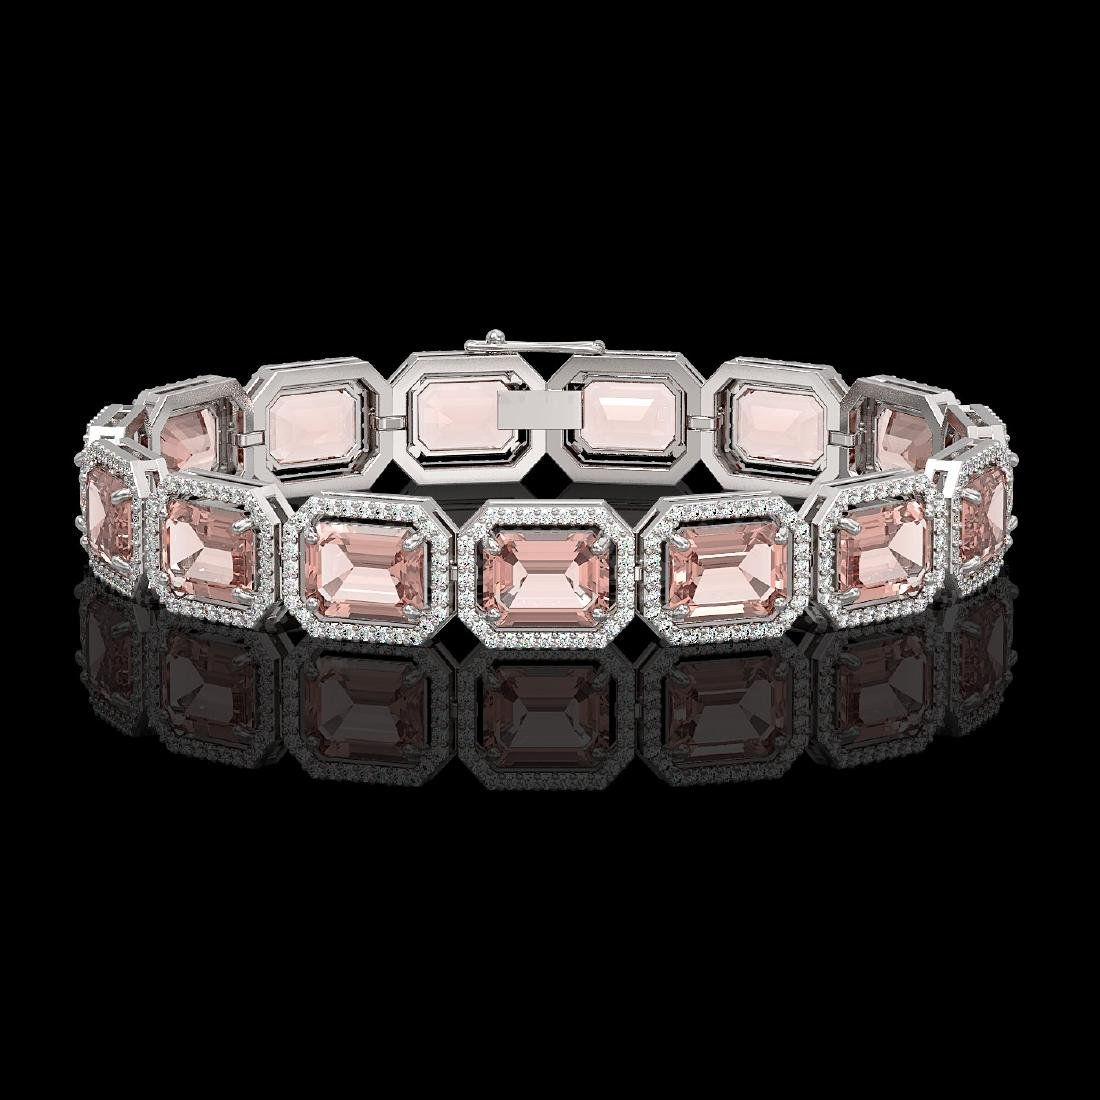 37.11 CTW Morganite & Diamond Halo Bracelet 10K White